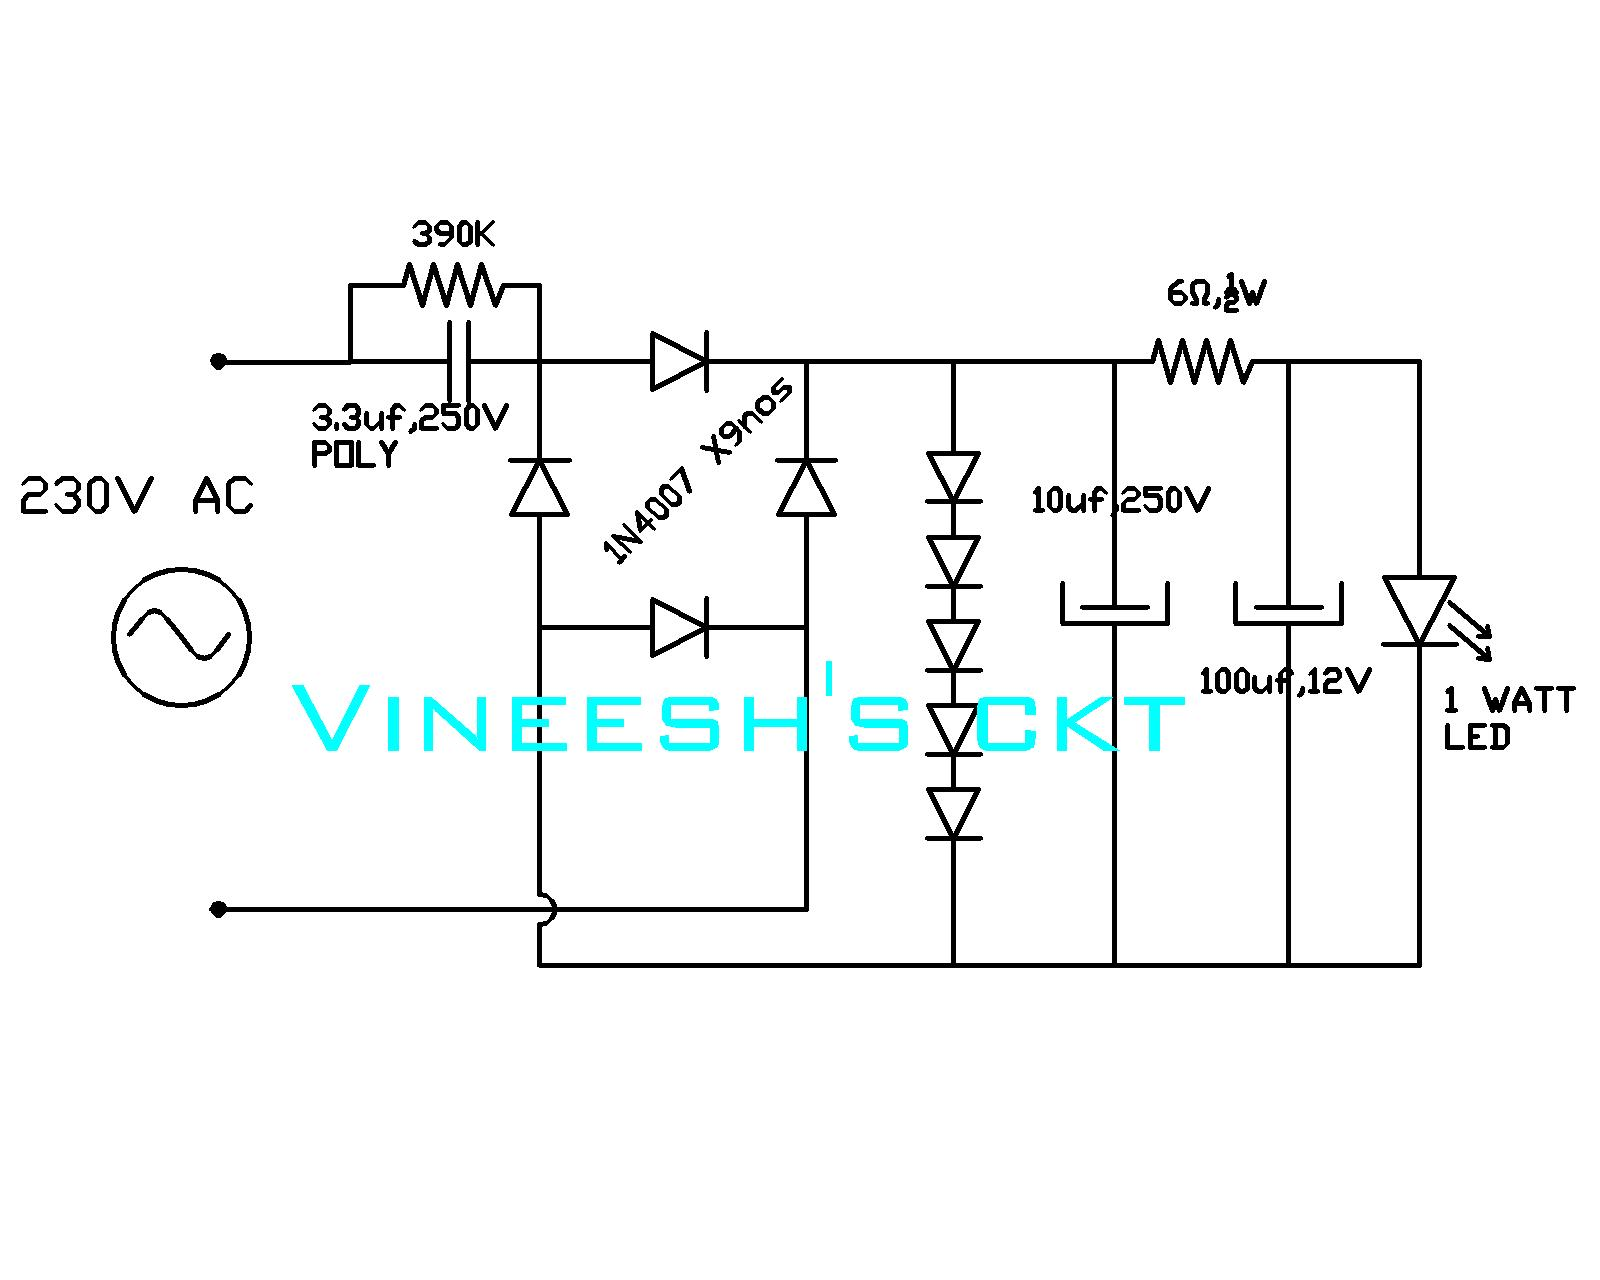 12v led circuit led experiments